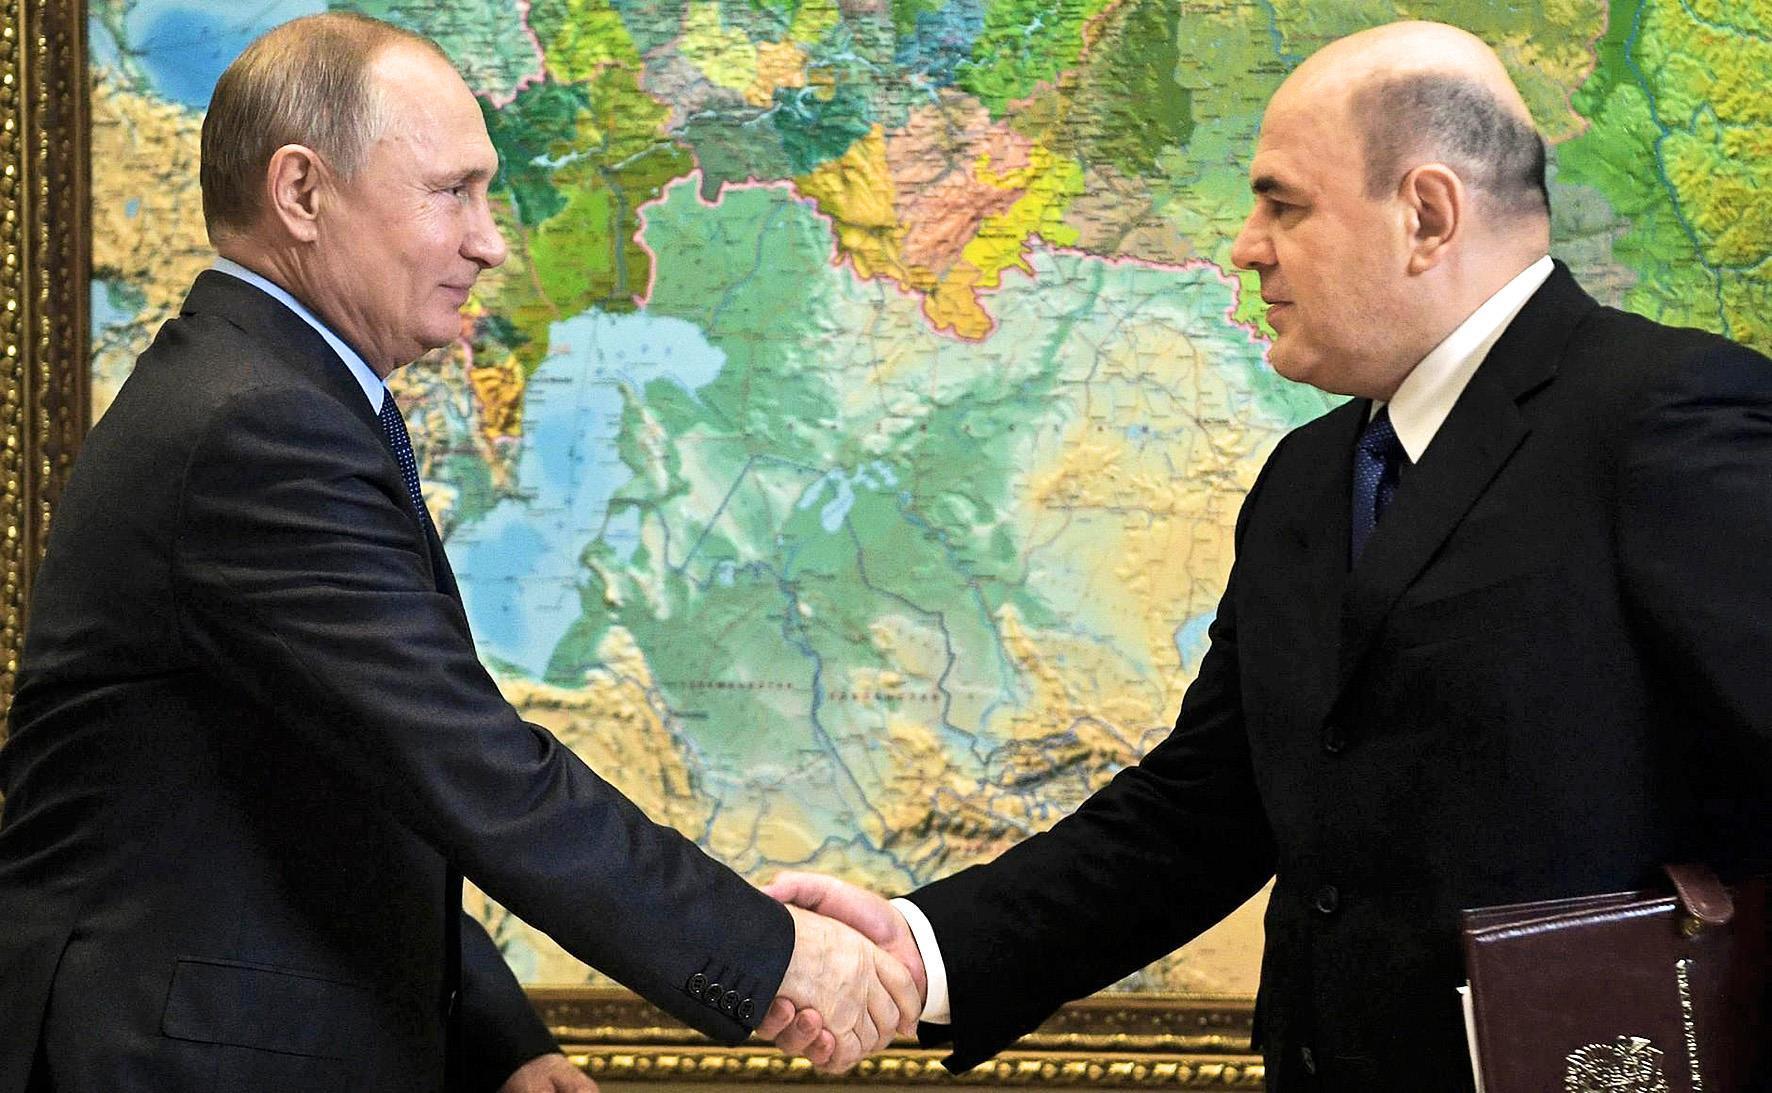 Chi è Michail Vladimirovič Mishustin, il nuovo Primo Ministro proposto dal presidente Putin